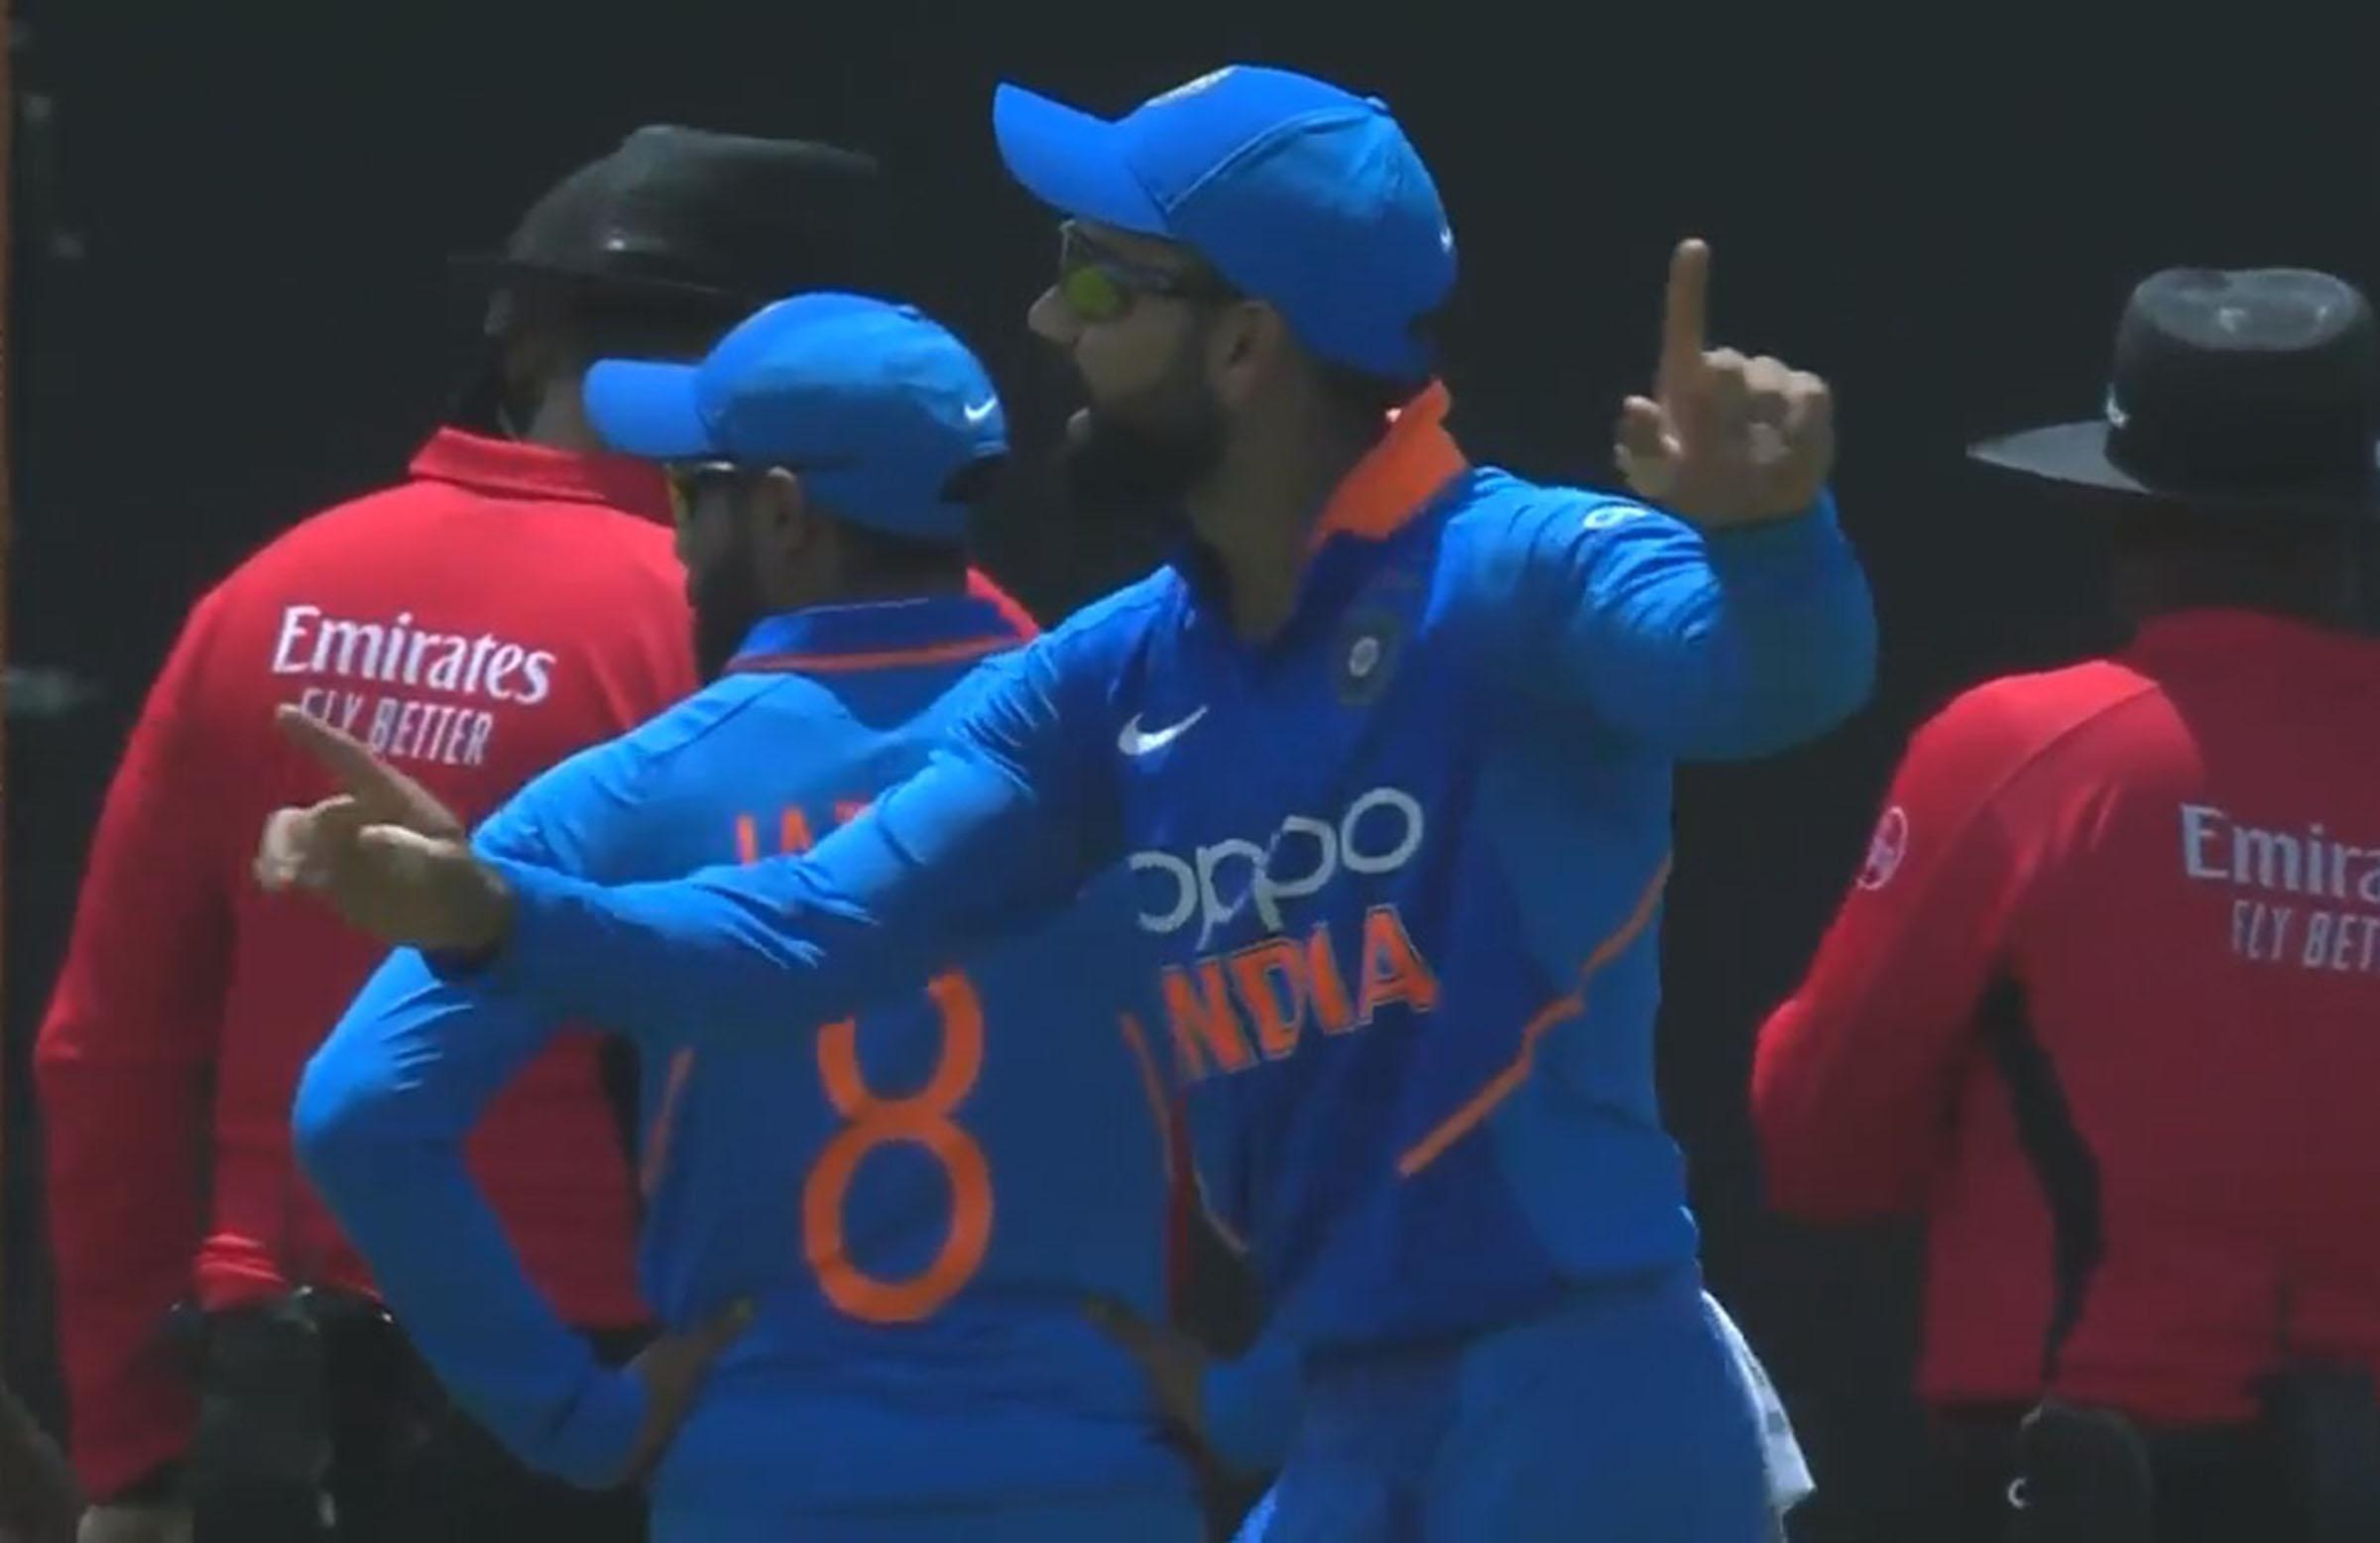 Kohli busts a move as he waits for play to resume